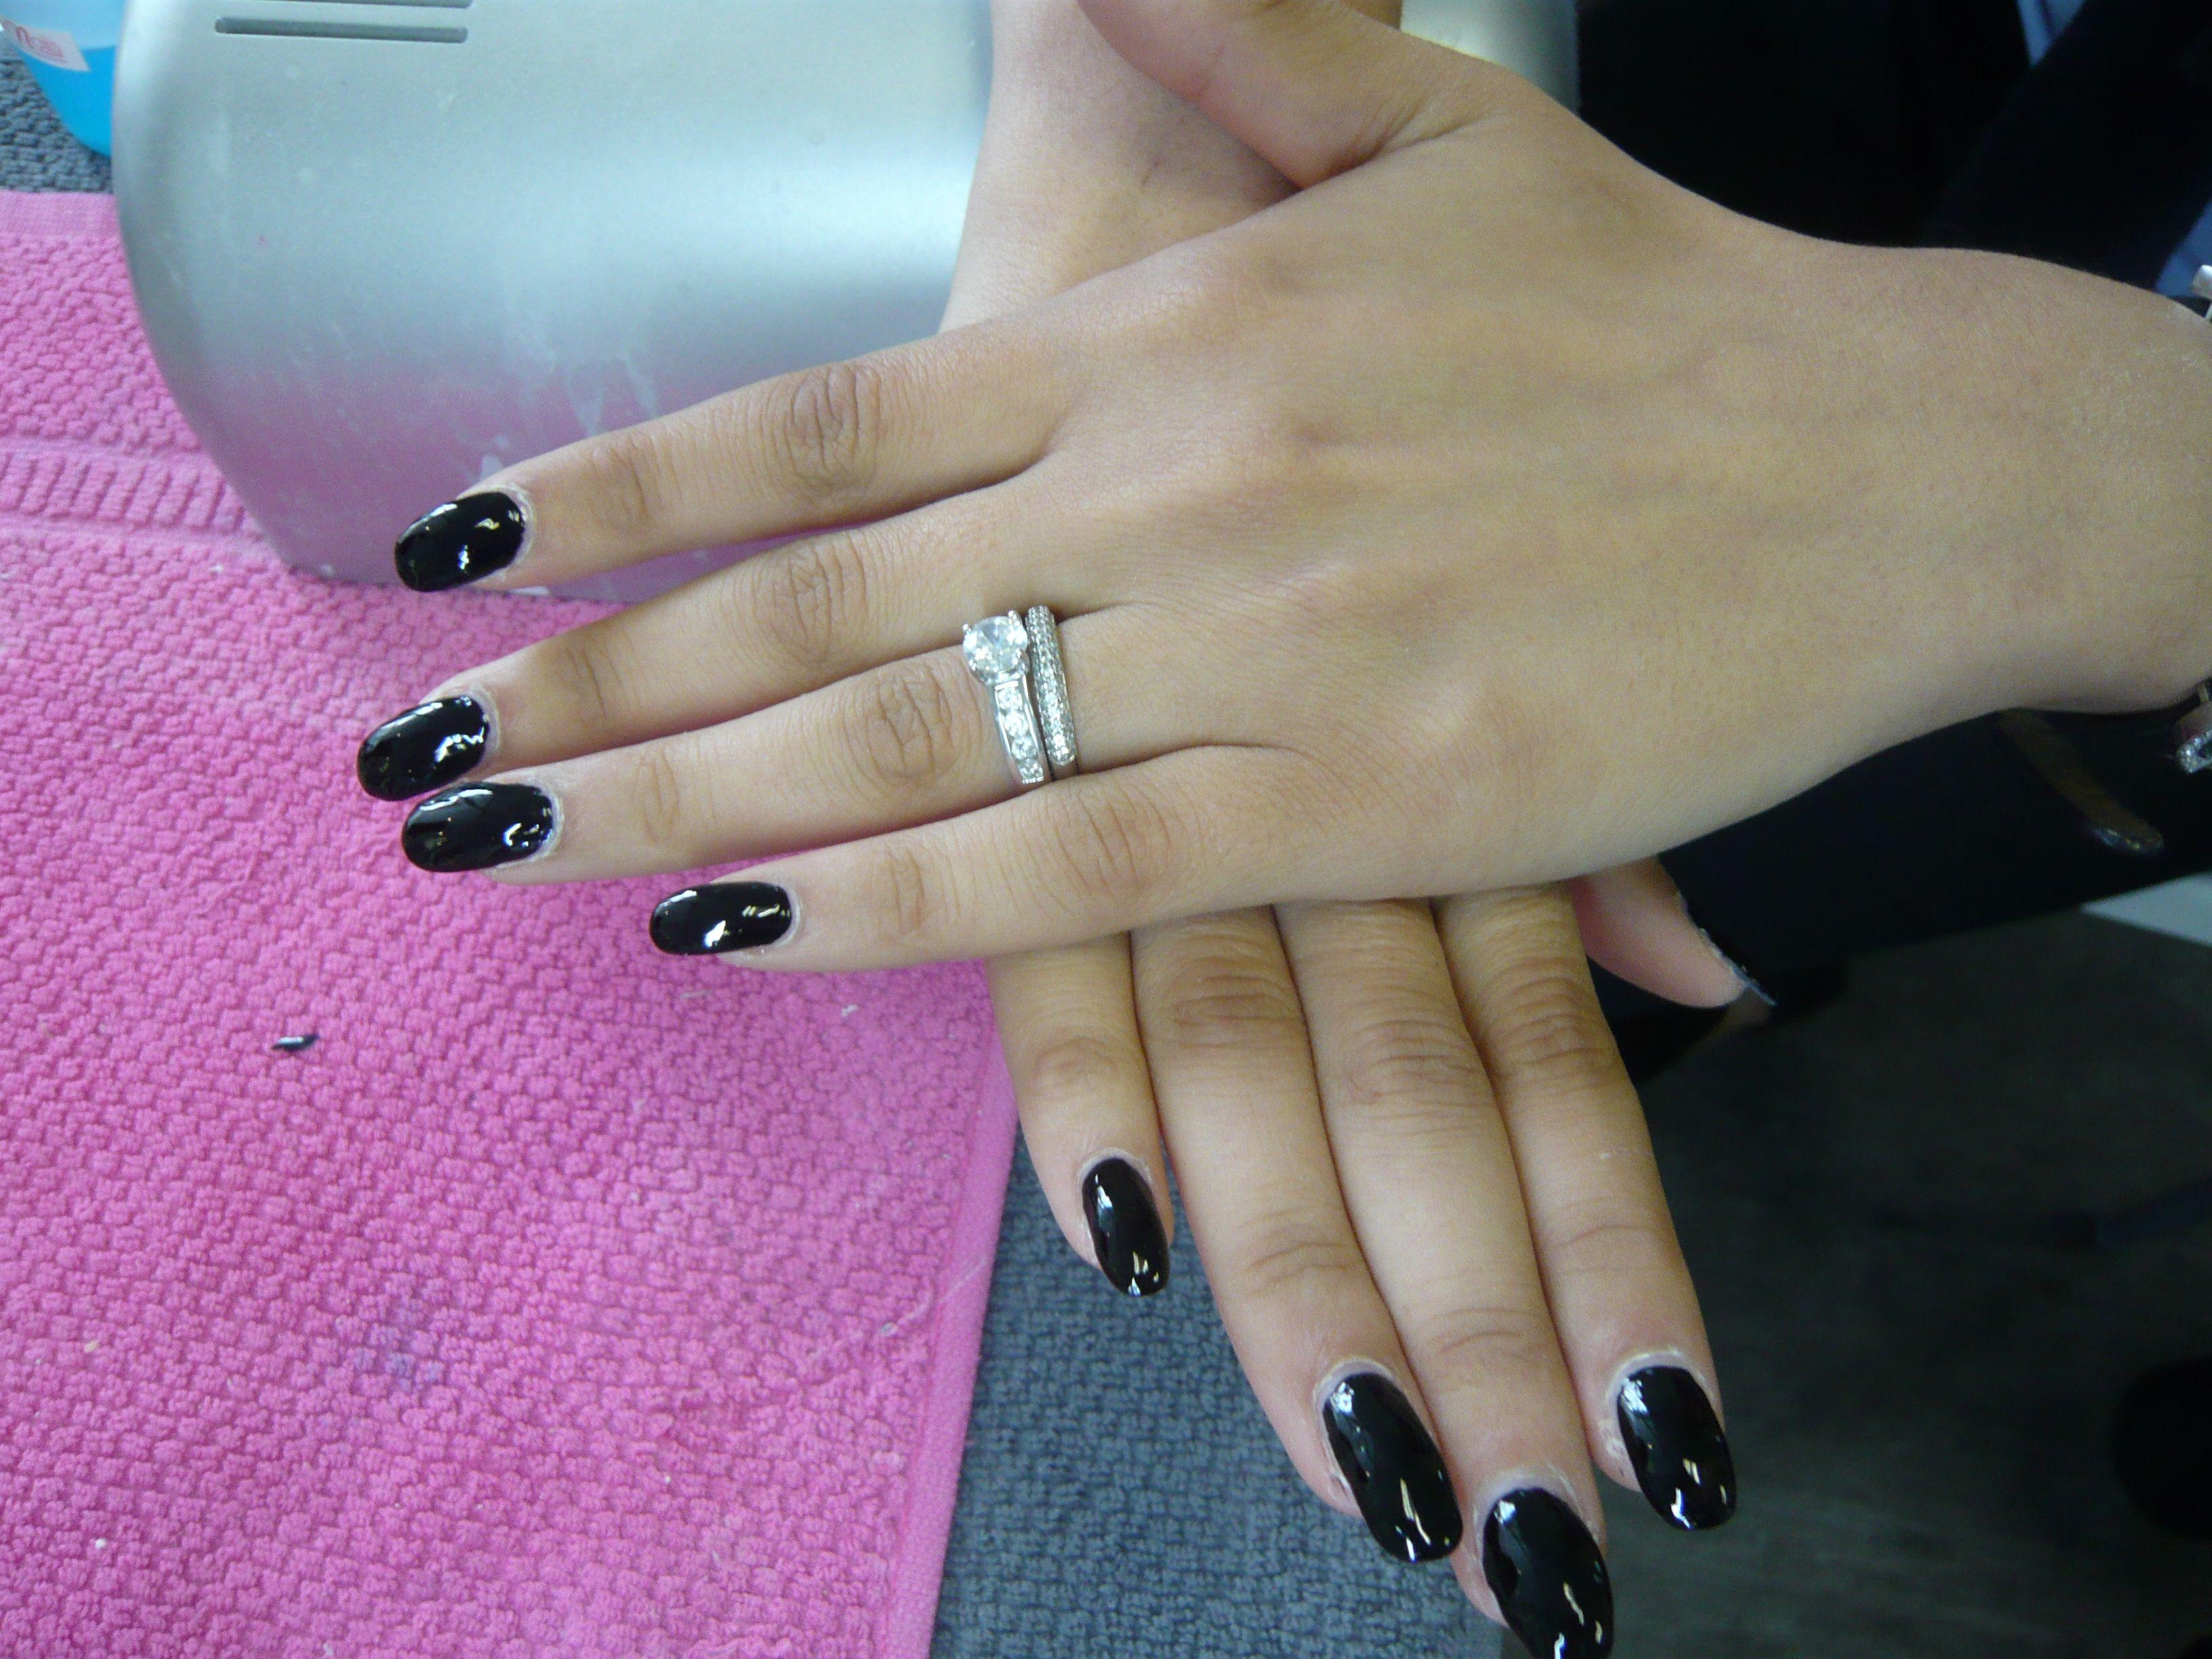 ongles en gel et vernis noir pour cette manucure nails. Black Bedroom Furniture Sets. Home Design Ideas